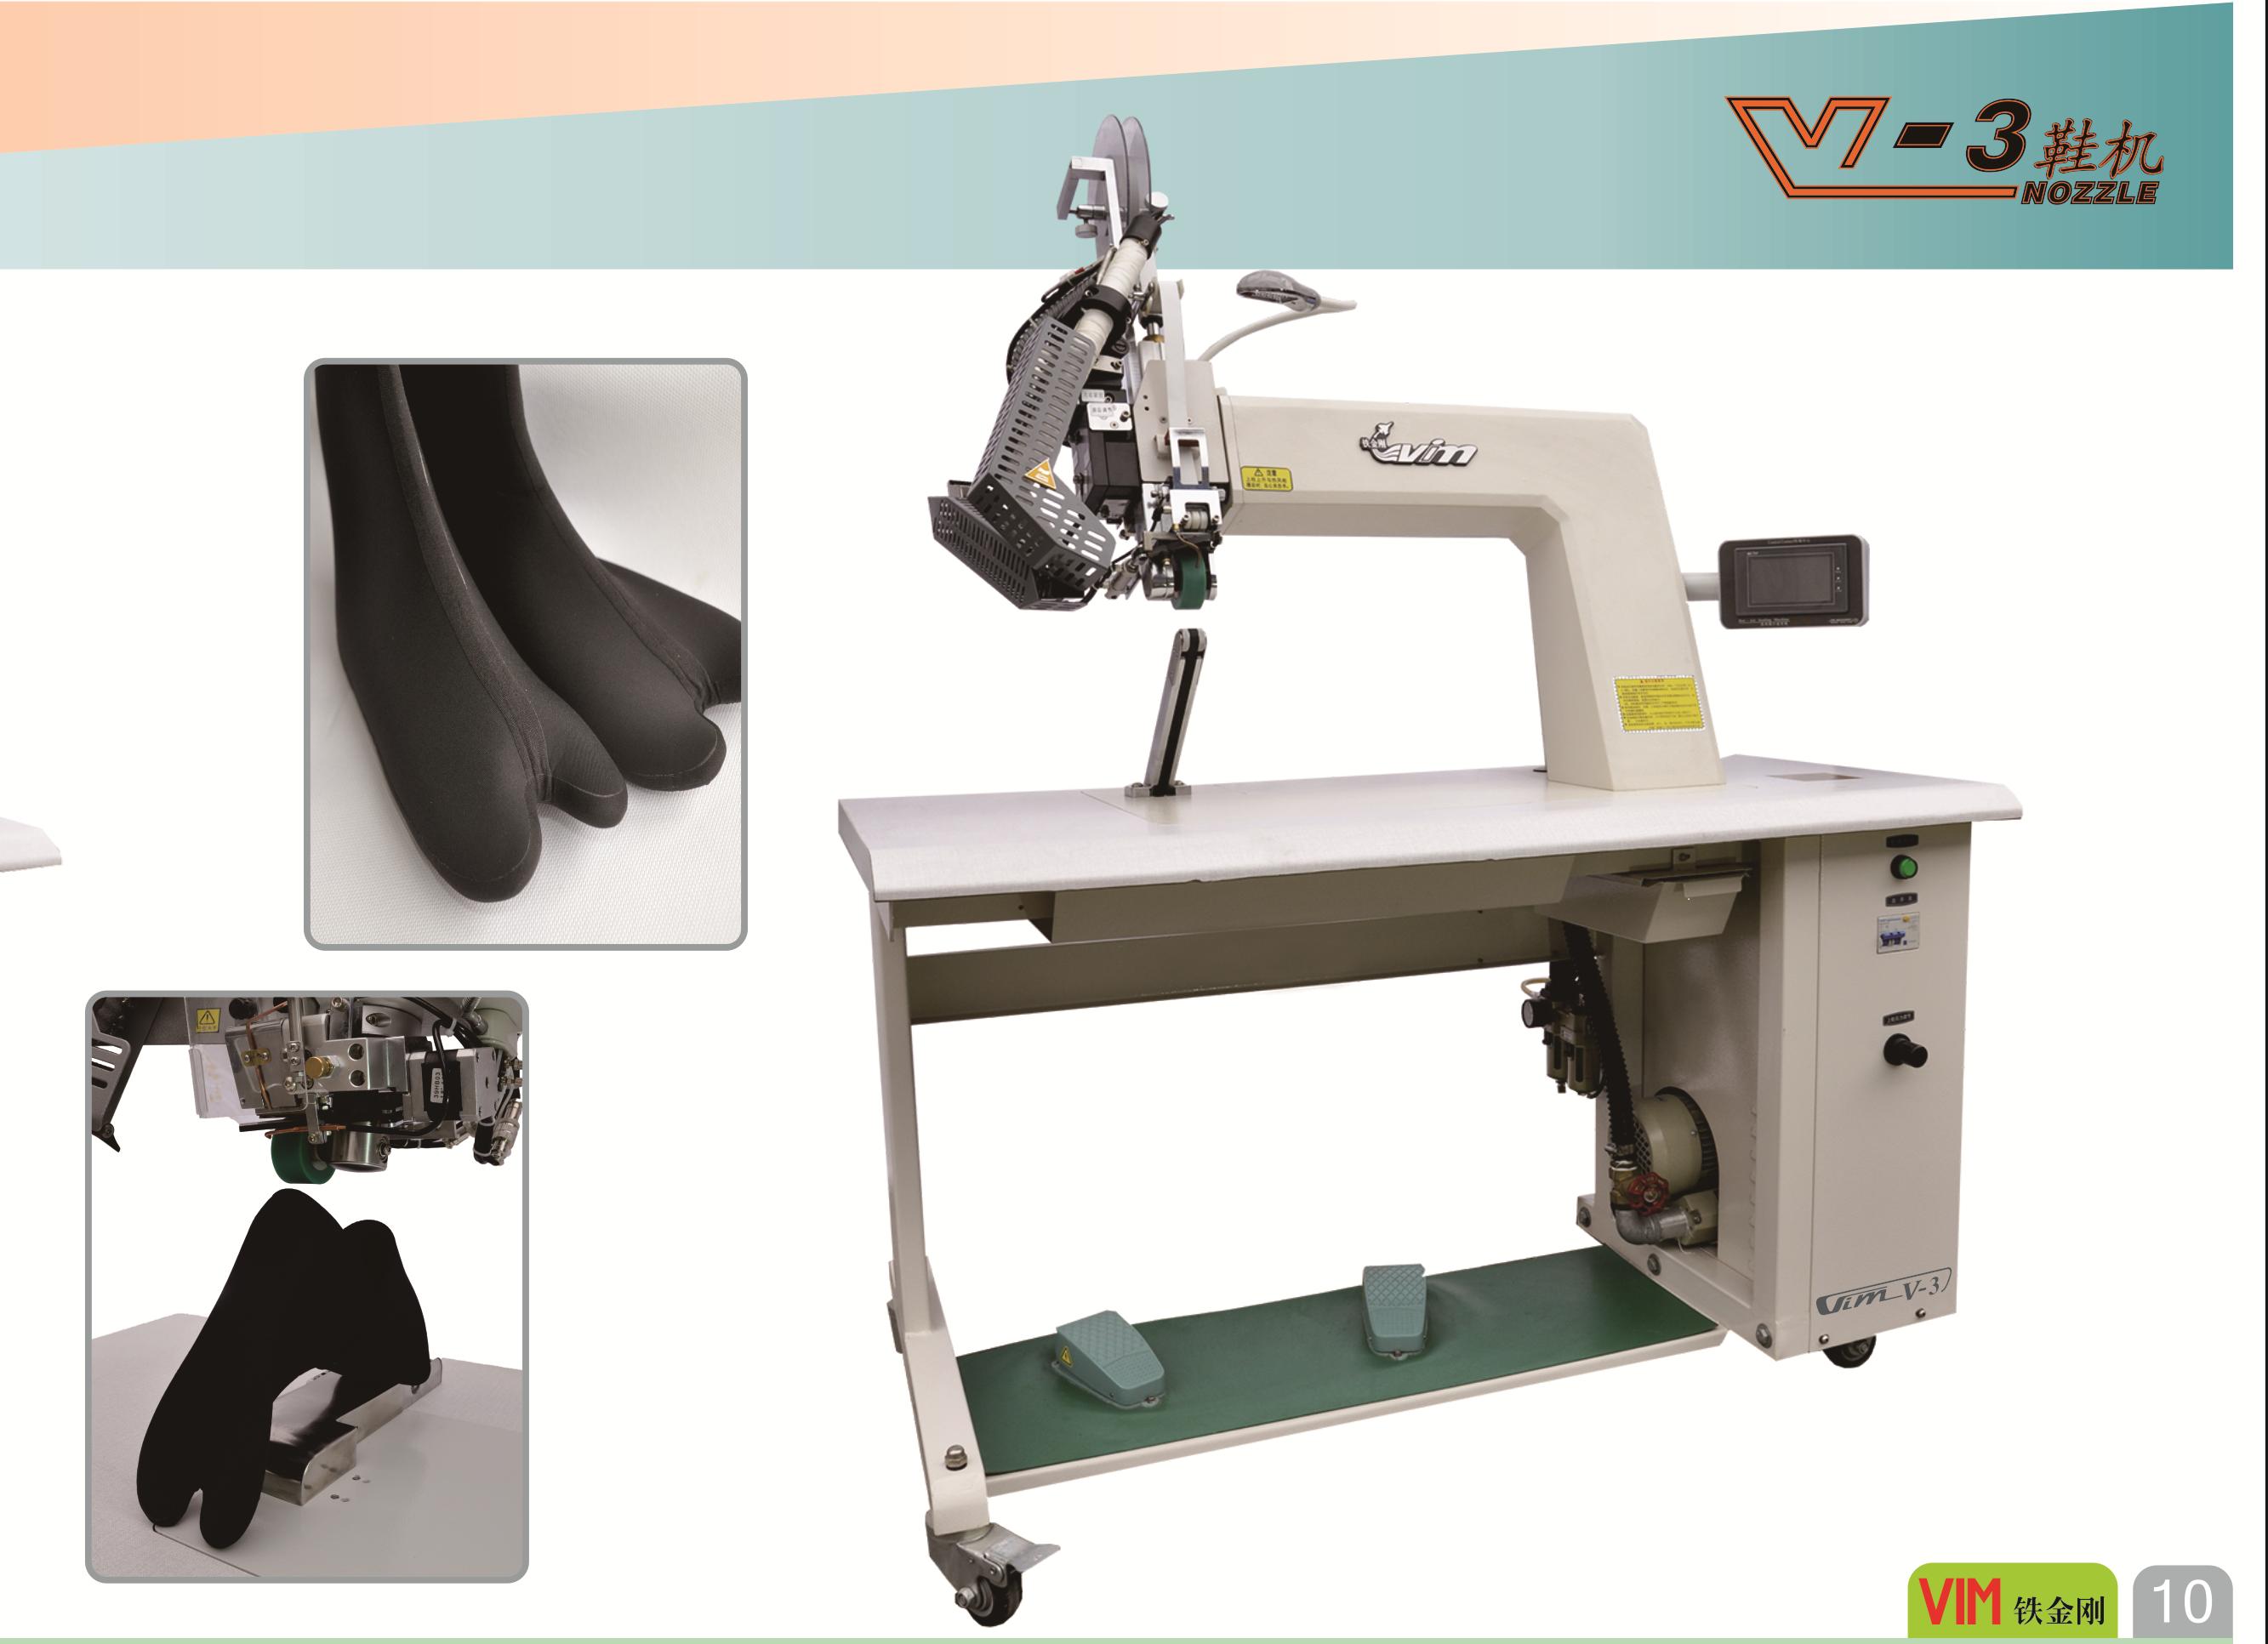 Hot Air Seam Sealing Machine/Shoe making machine/climbing shoes machine/